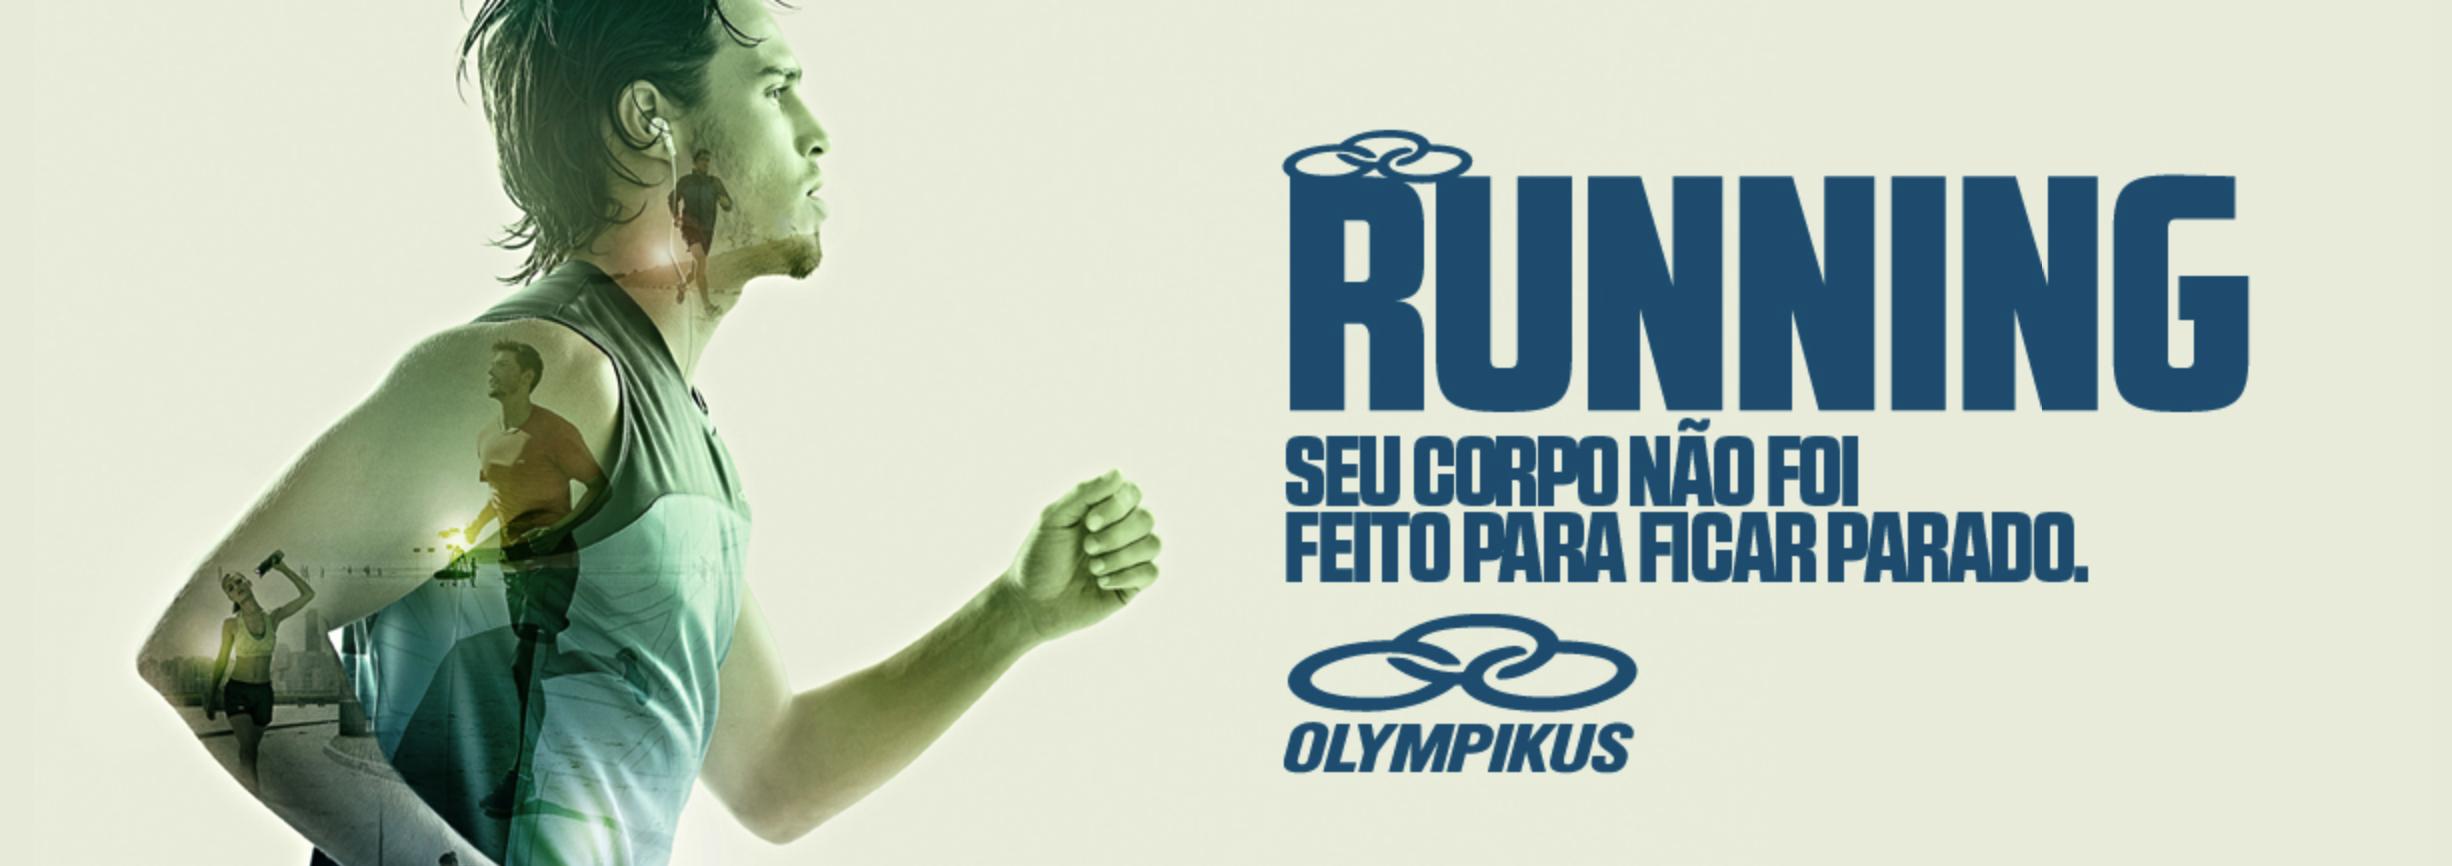 Olympikus Ads